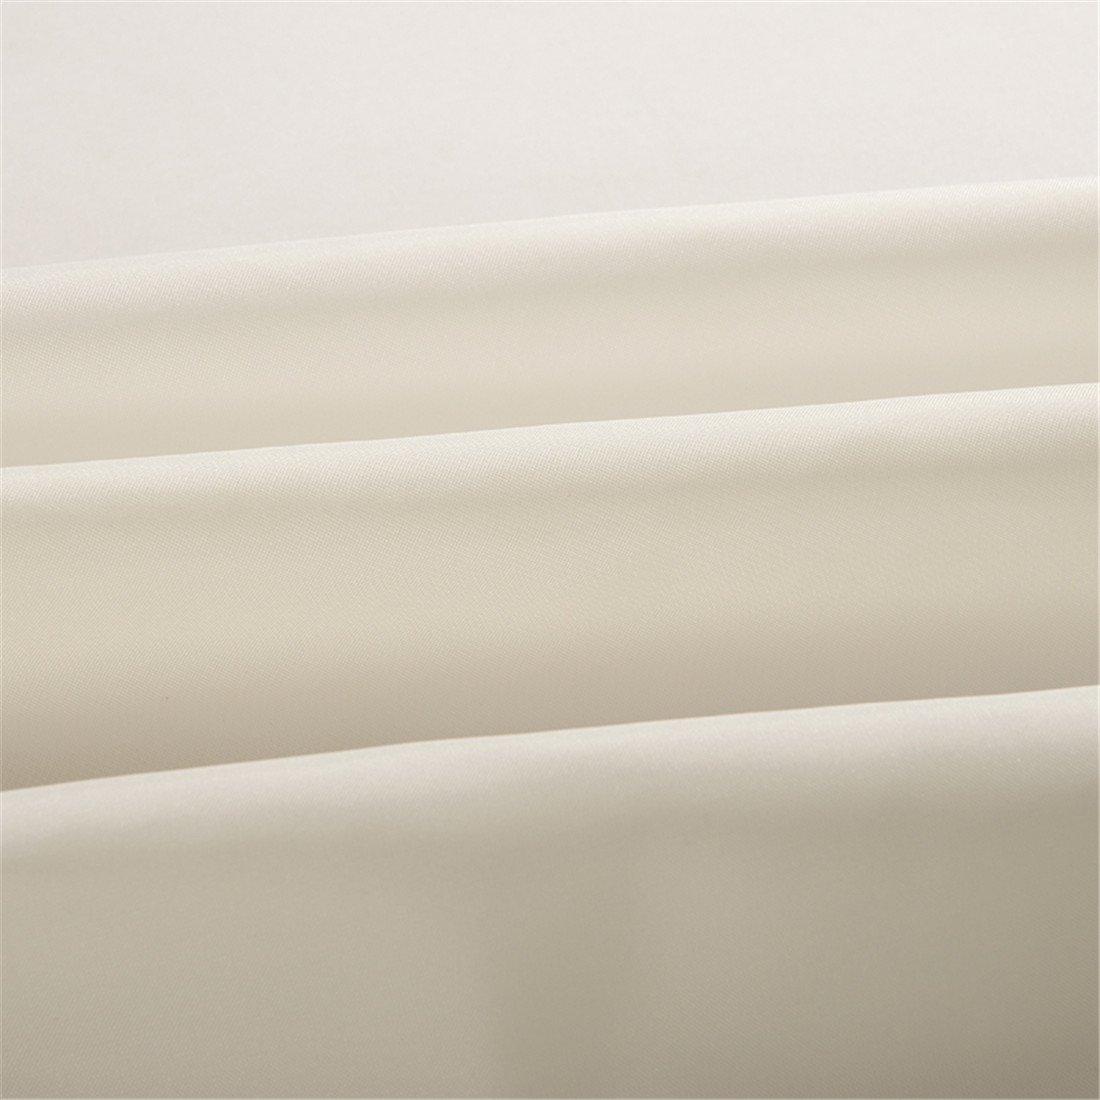 beige LUCKYHOUSEHOME Ganchos para cortina de ducha impermeable poli/éster tejido de poli/éster color beige 100 x 180 cm Wide x Height:39 x 71 inch resistente al moho